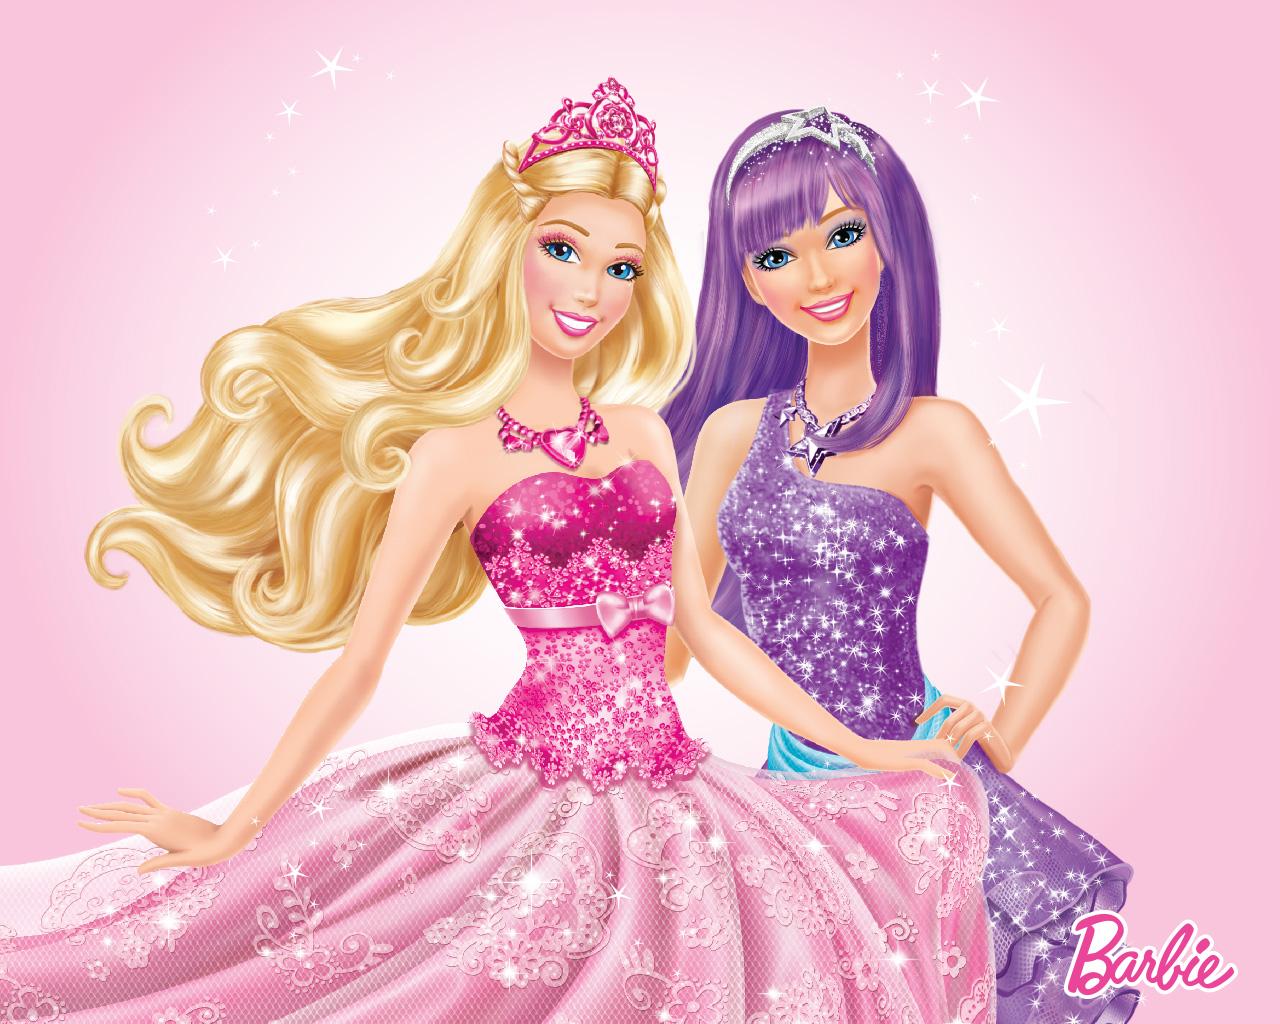 Barbie popstar clipart.